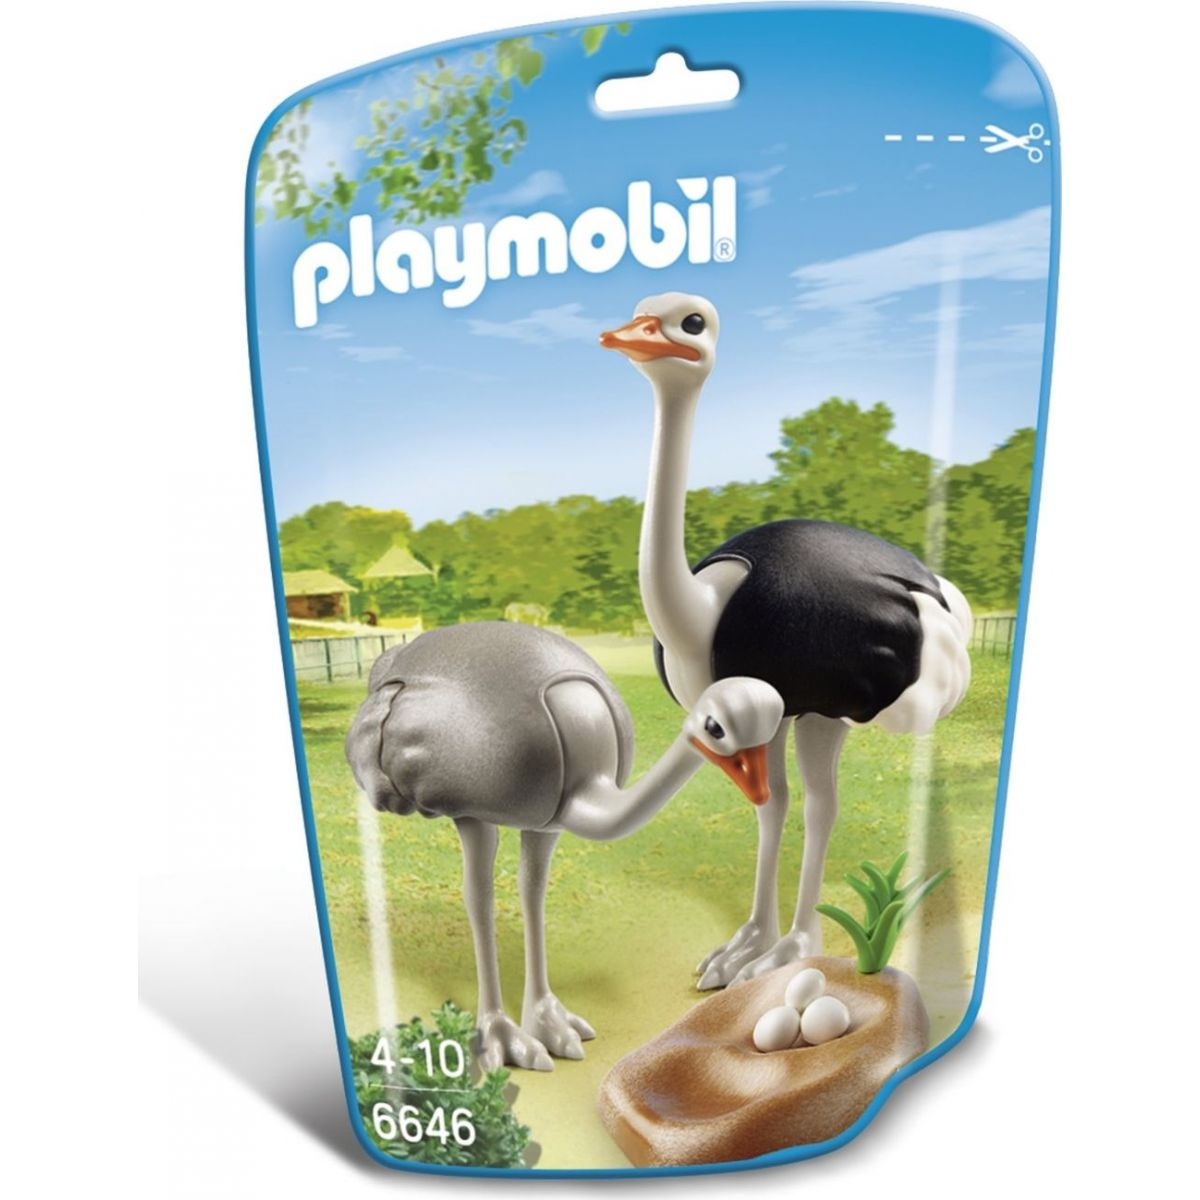 Playmobil 6646 Pštrosi s hnízdem